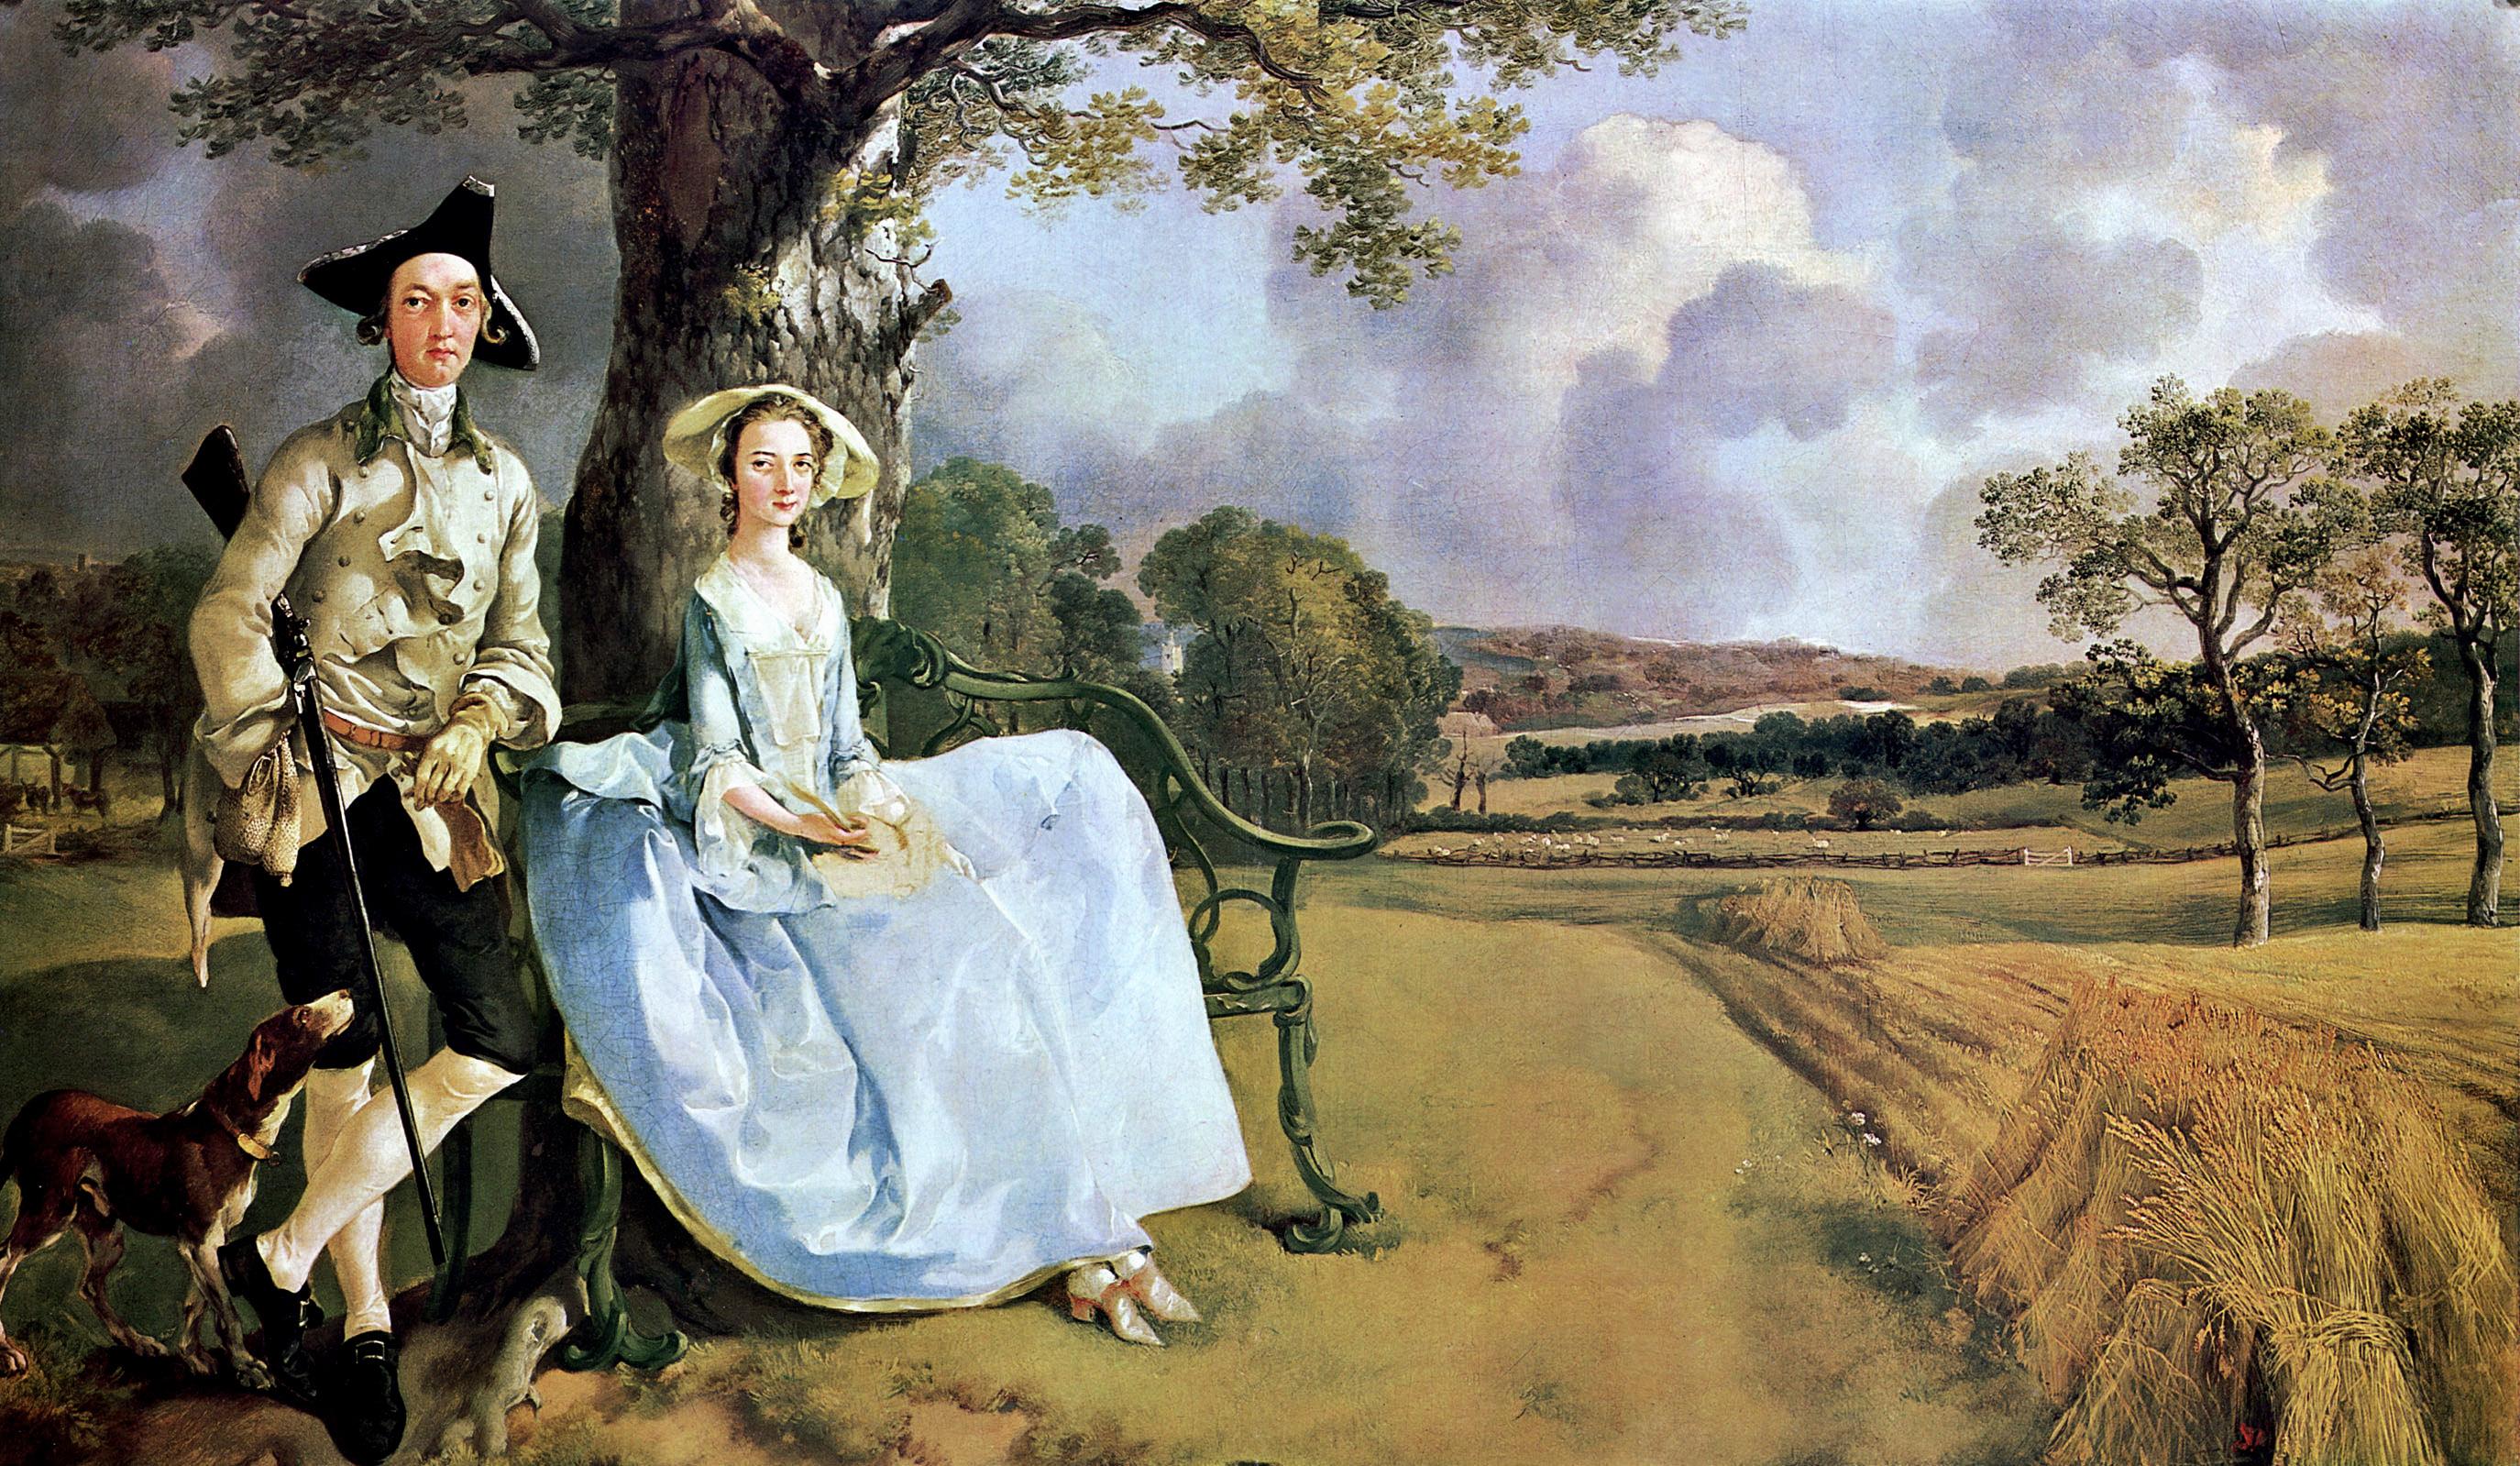 Archivo:Gainsborough-Andrews.jpg